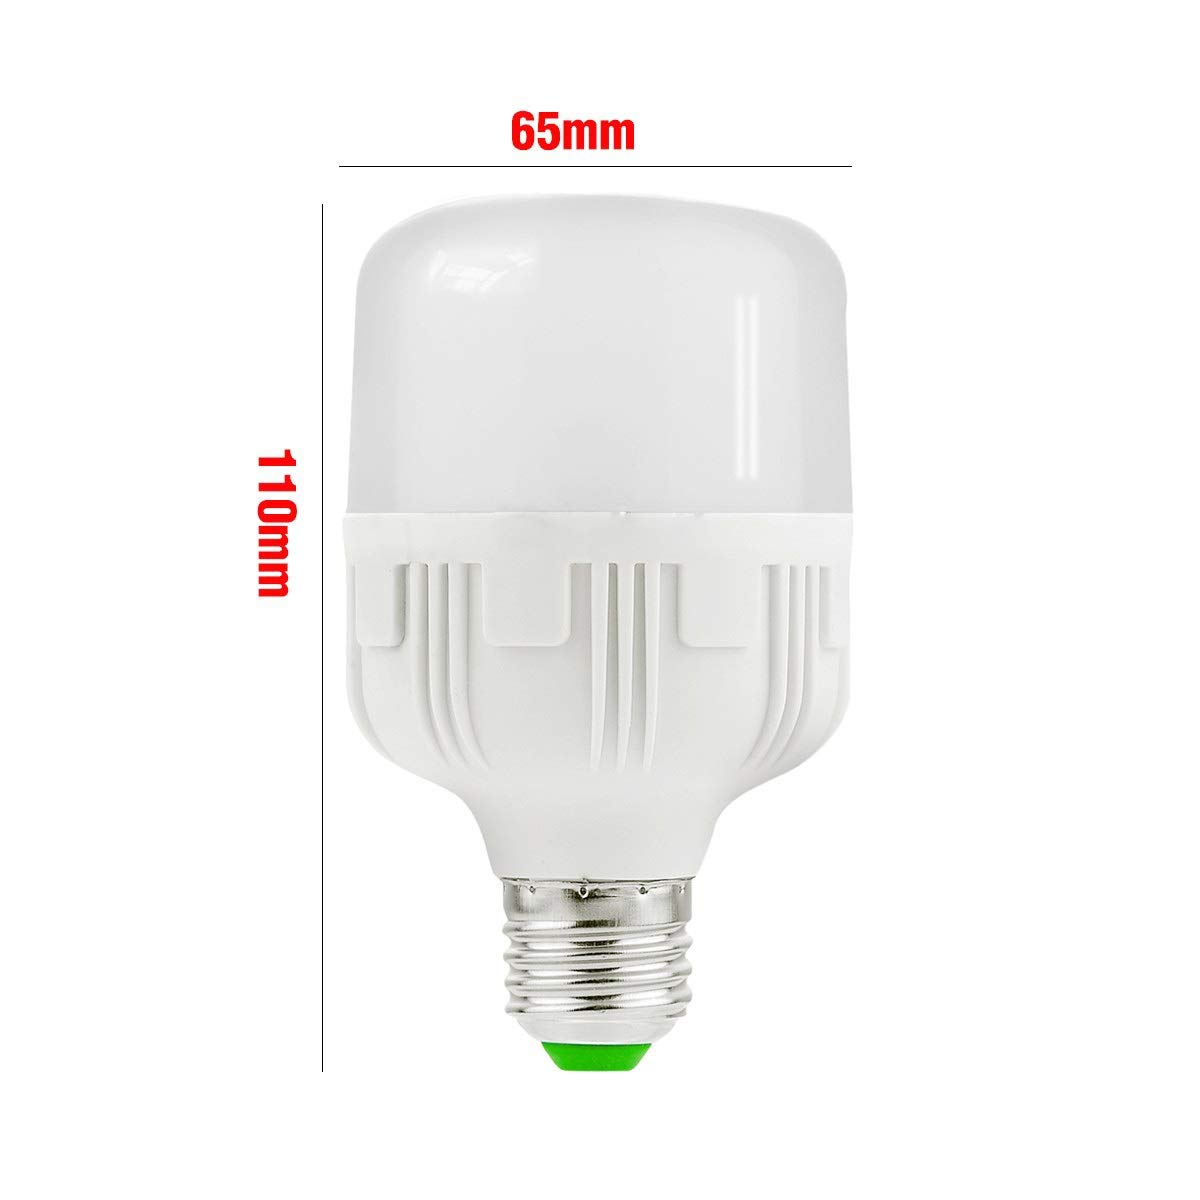 AC85-265V LLP-LED E27//E26 LED Bulbs 2835SMD 14W 30LED 1200-1350Lm Warm White Cool White Super High Brightness LED Bulb Lamps Size : Cold White